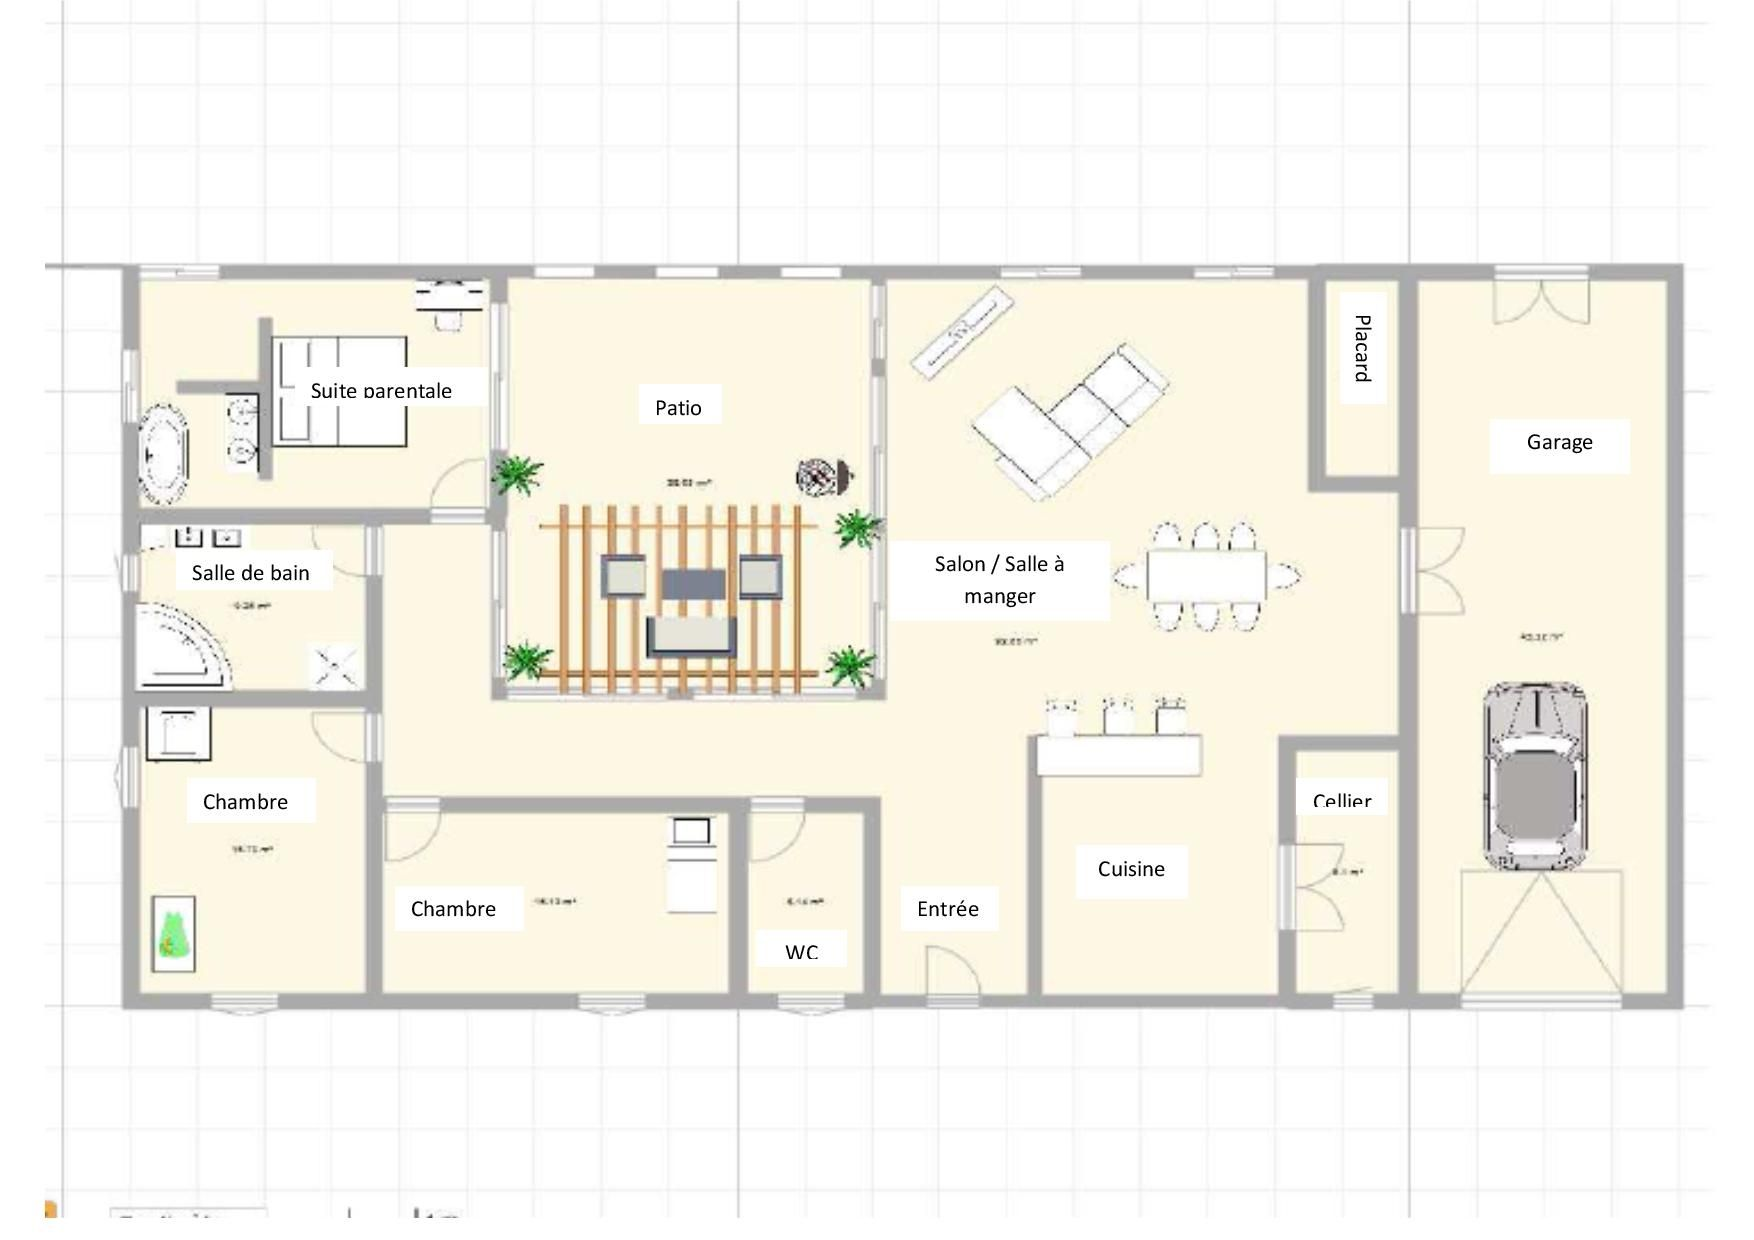 f73a948425a68 Plan maison 3 chambres avec patio